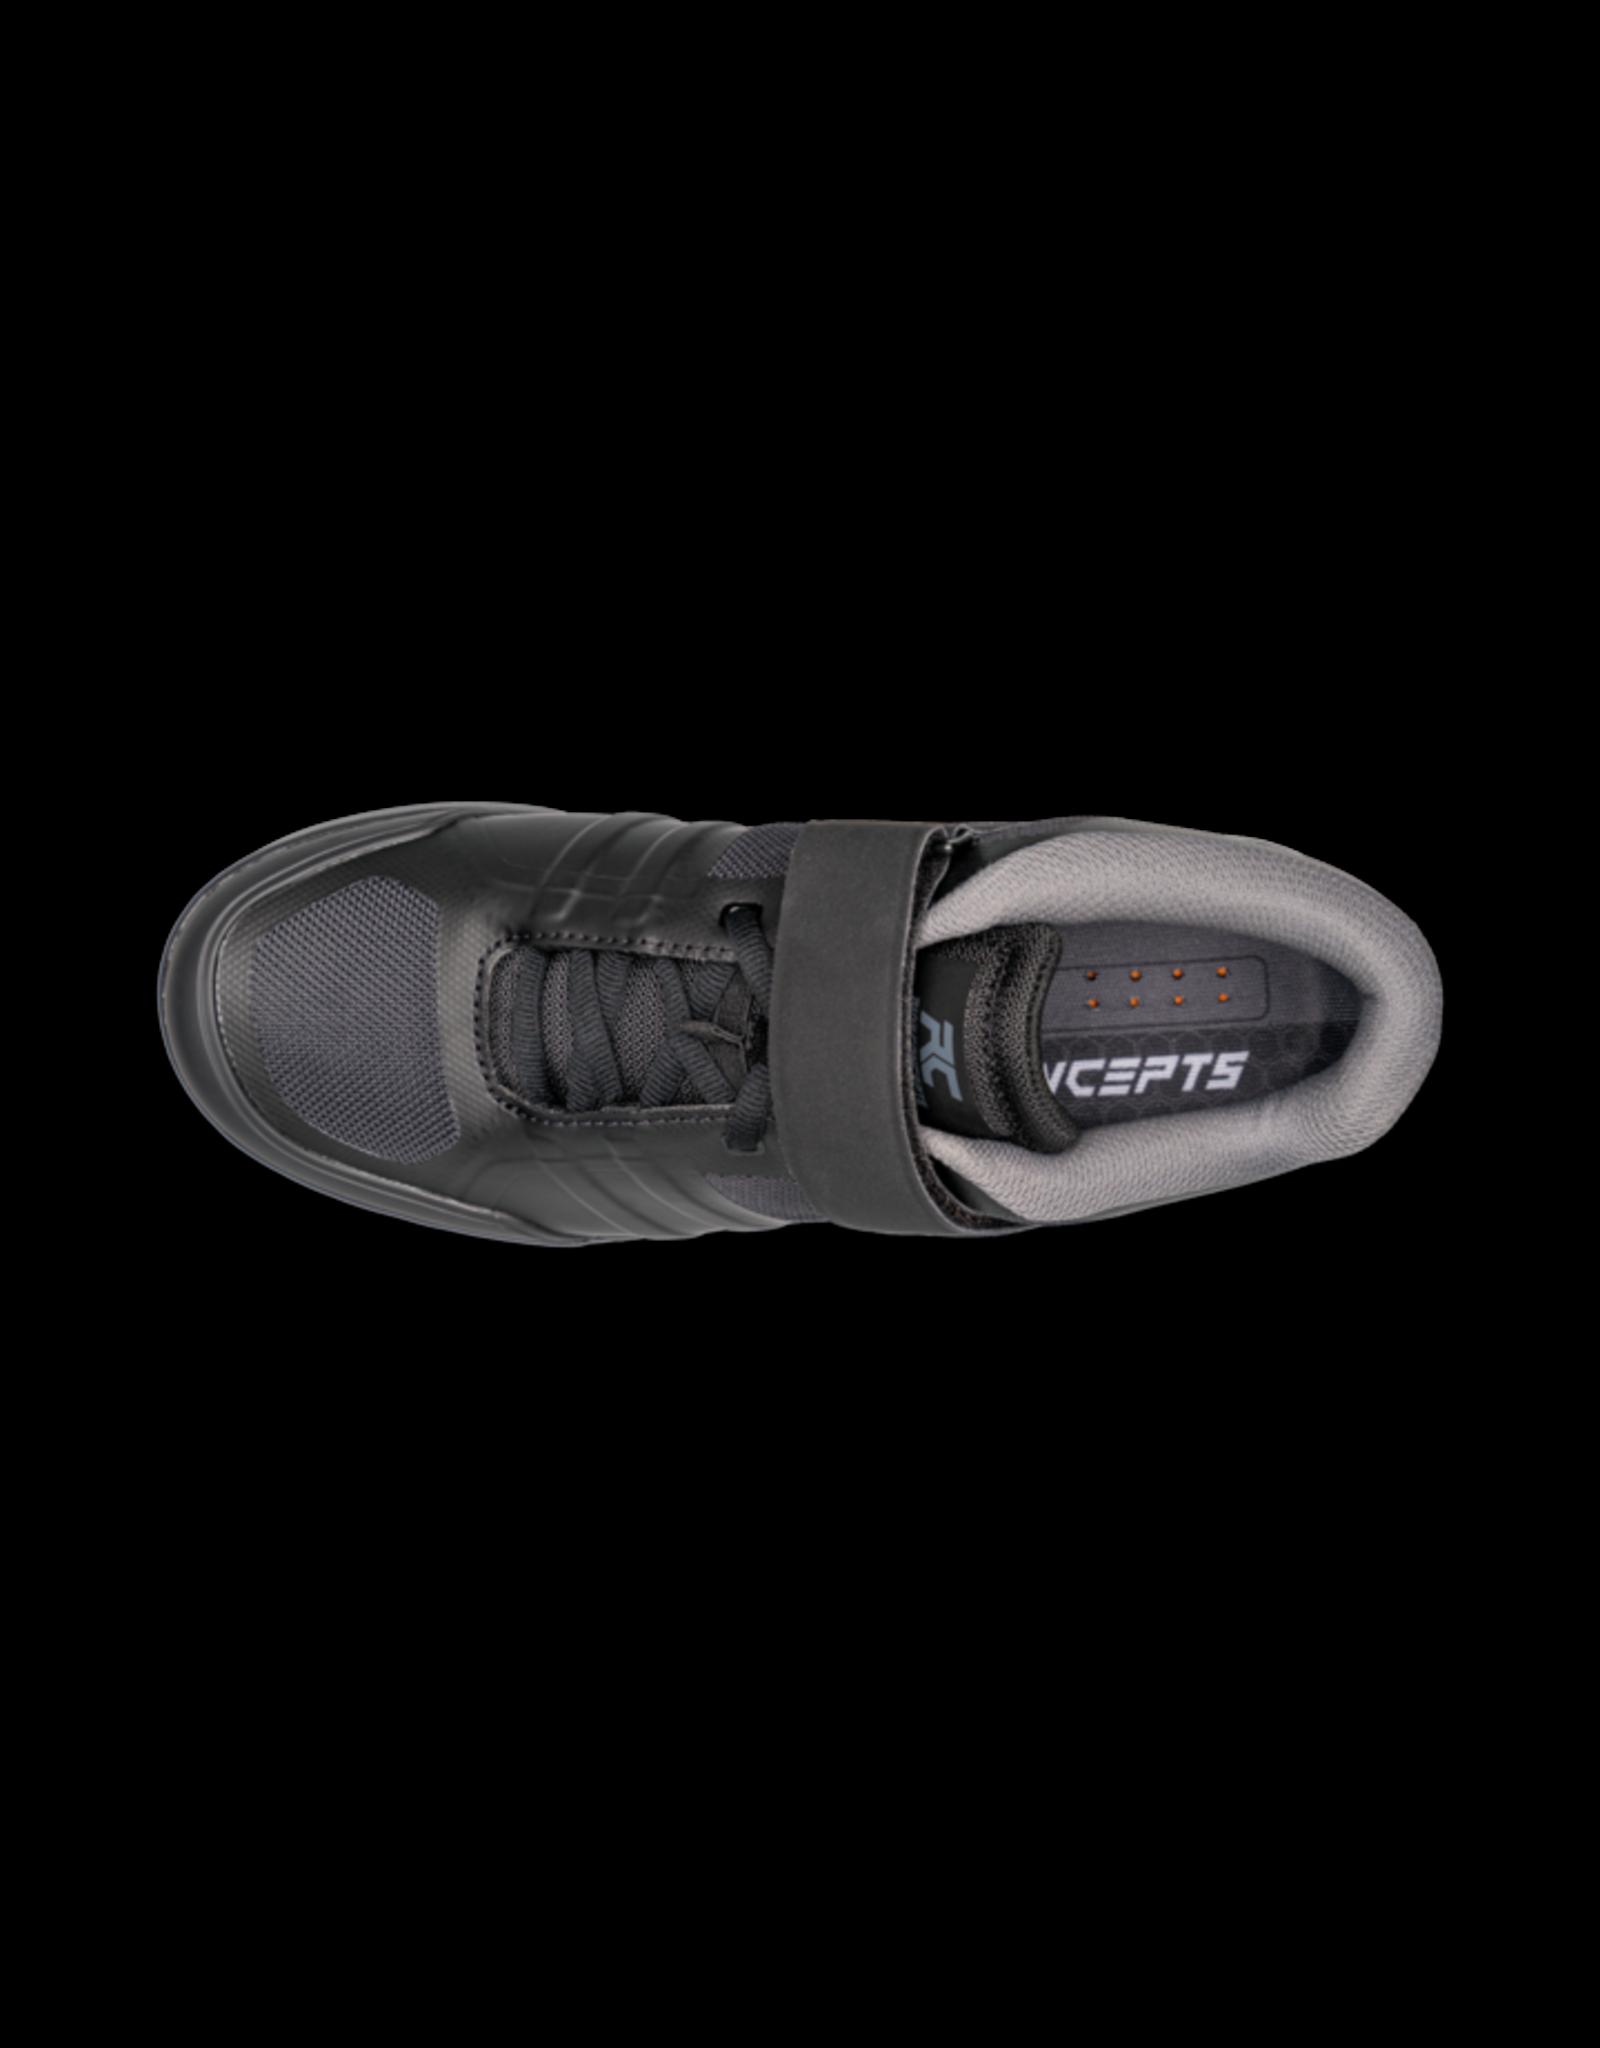 Ride Concepts Shoes Ride Concepts Transition mens